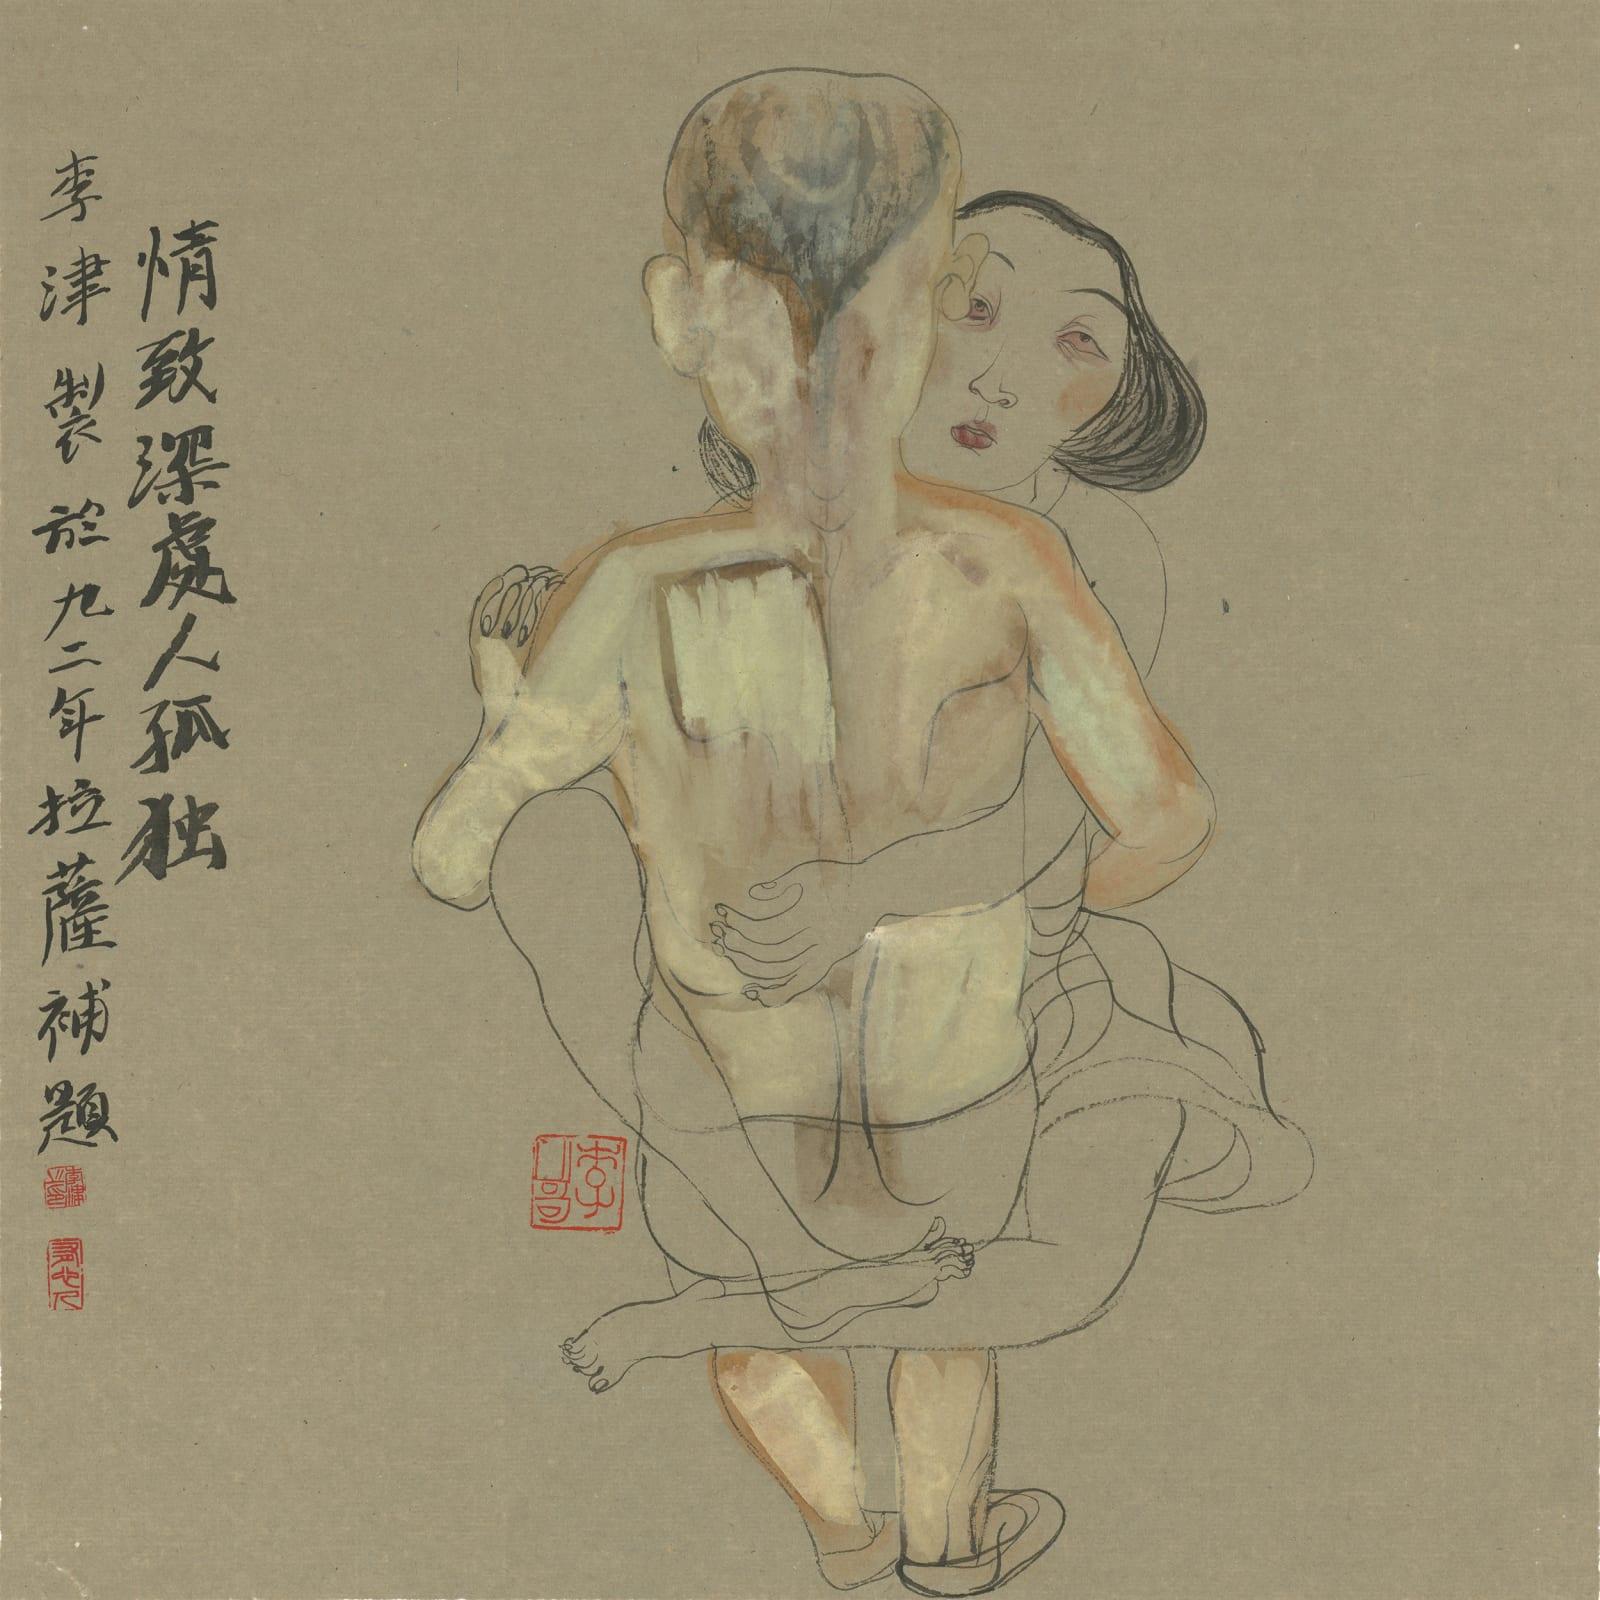 Li Jin 李津, Alone in the Depths of Passion 情至深处人孤独, 1992